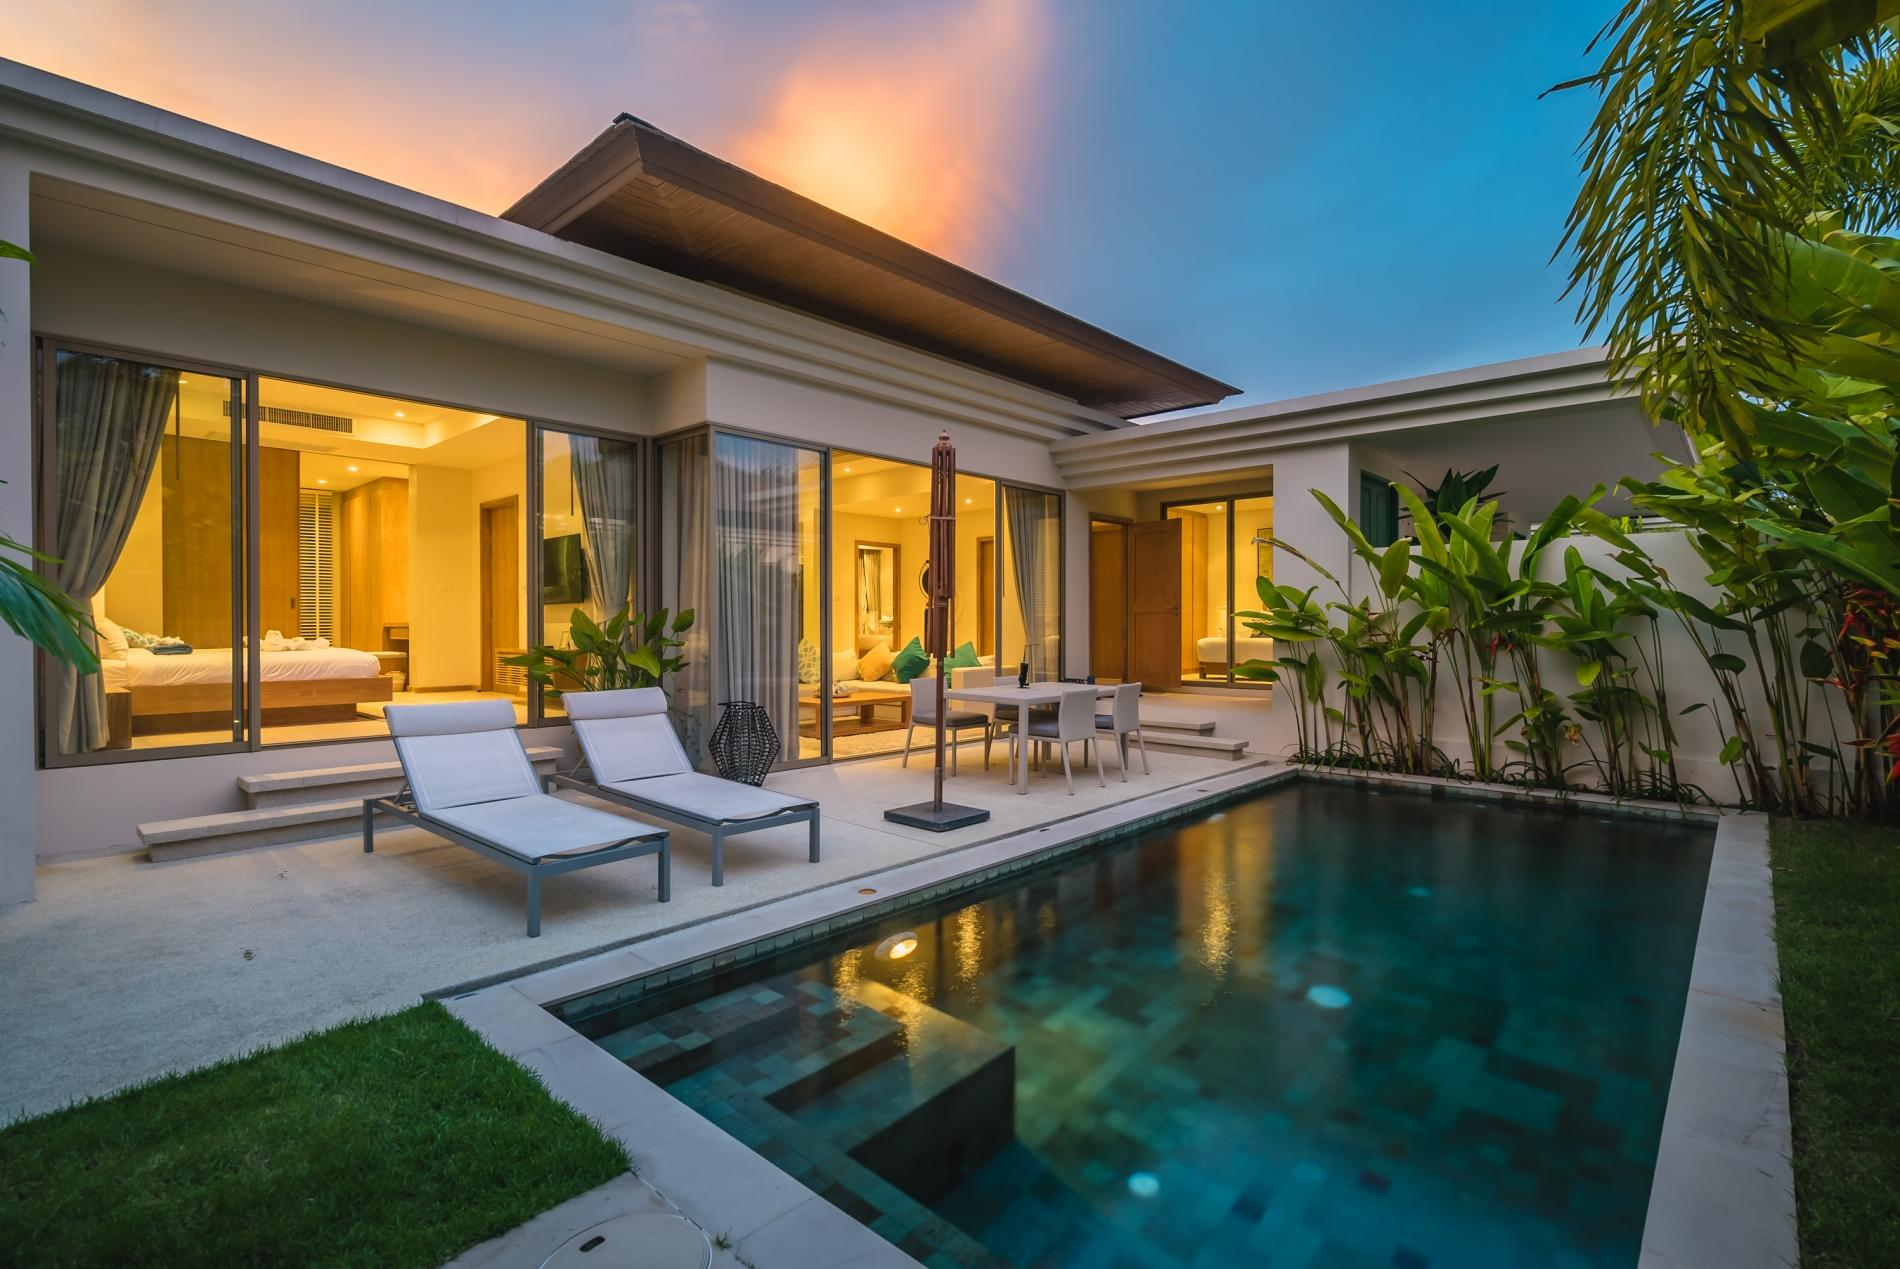 Trichada 18 - Private pool modern 3 bedroom villa